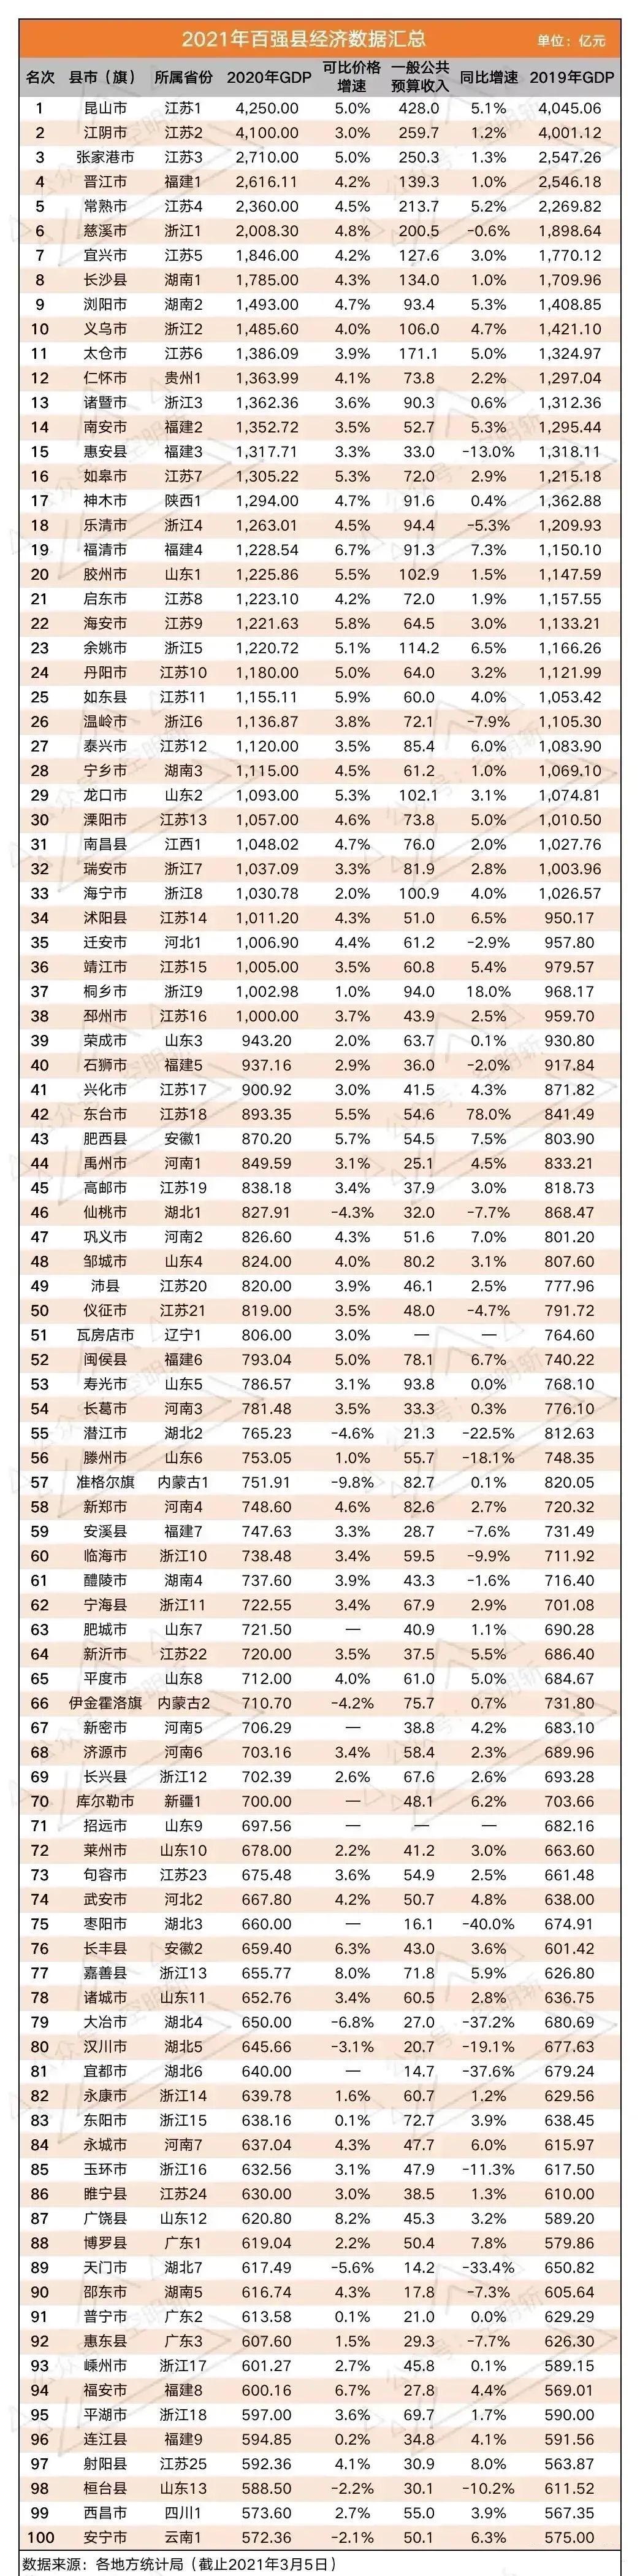 Gdp山东_山东日照市2020年人均GDP在全国内地城市中排名第104位!